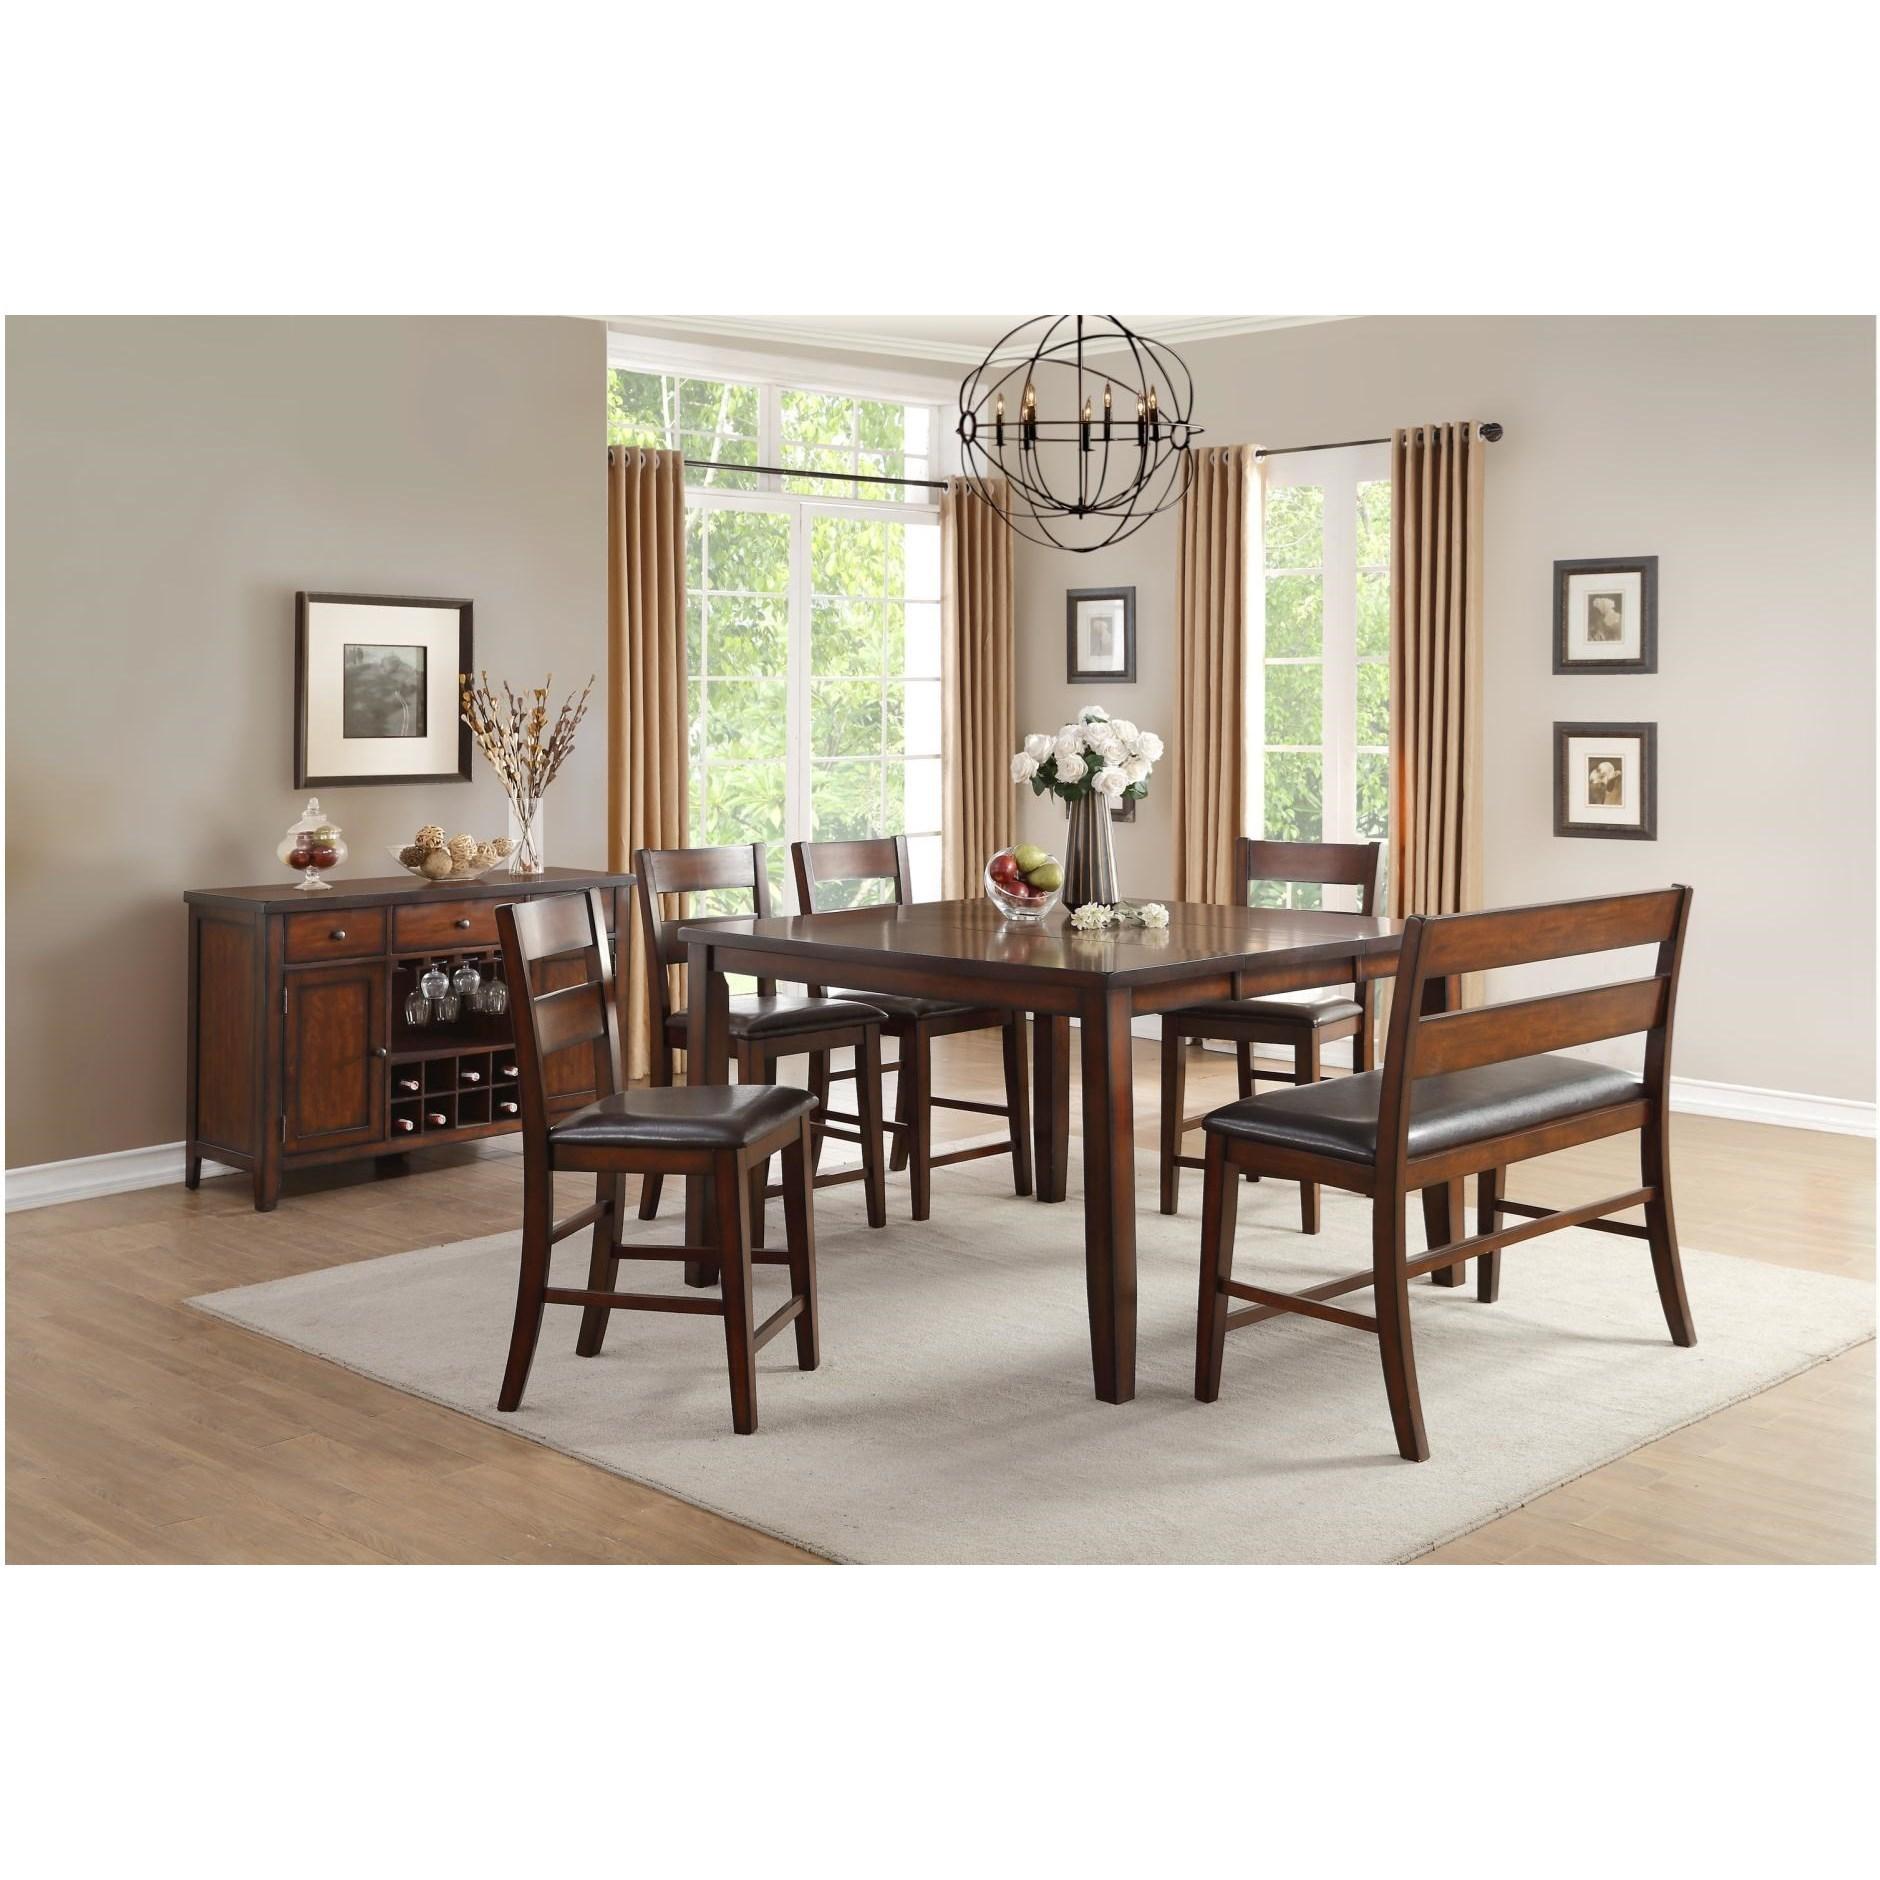 homelegance mantello casual dining room group beck 39 s. Black Bedroom Furniture Sets. Home Design Ideas